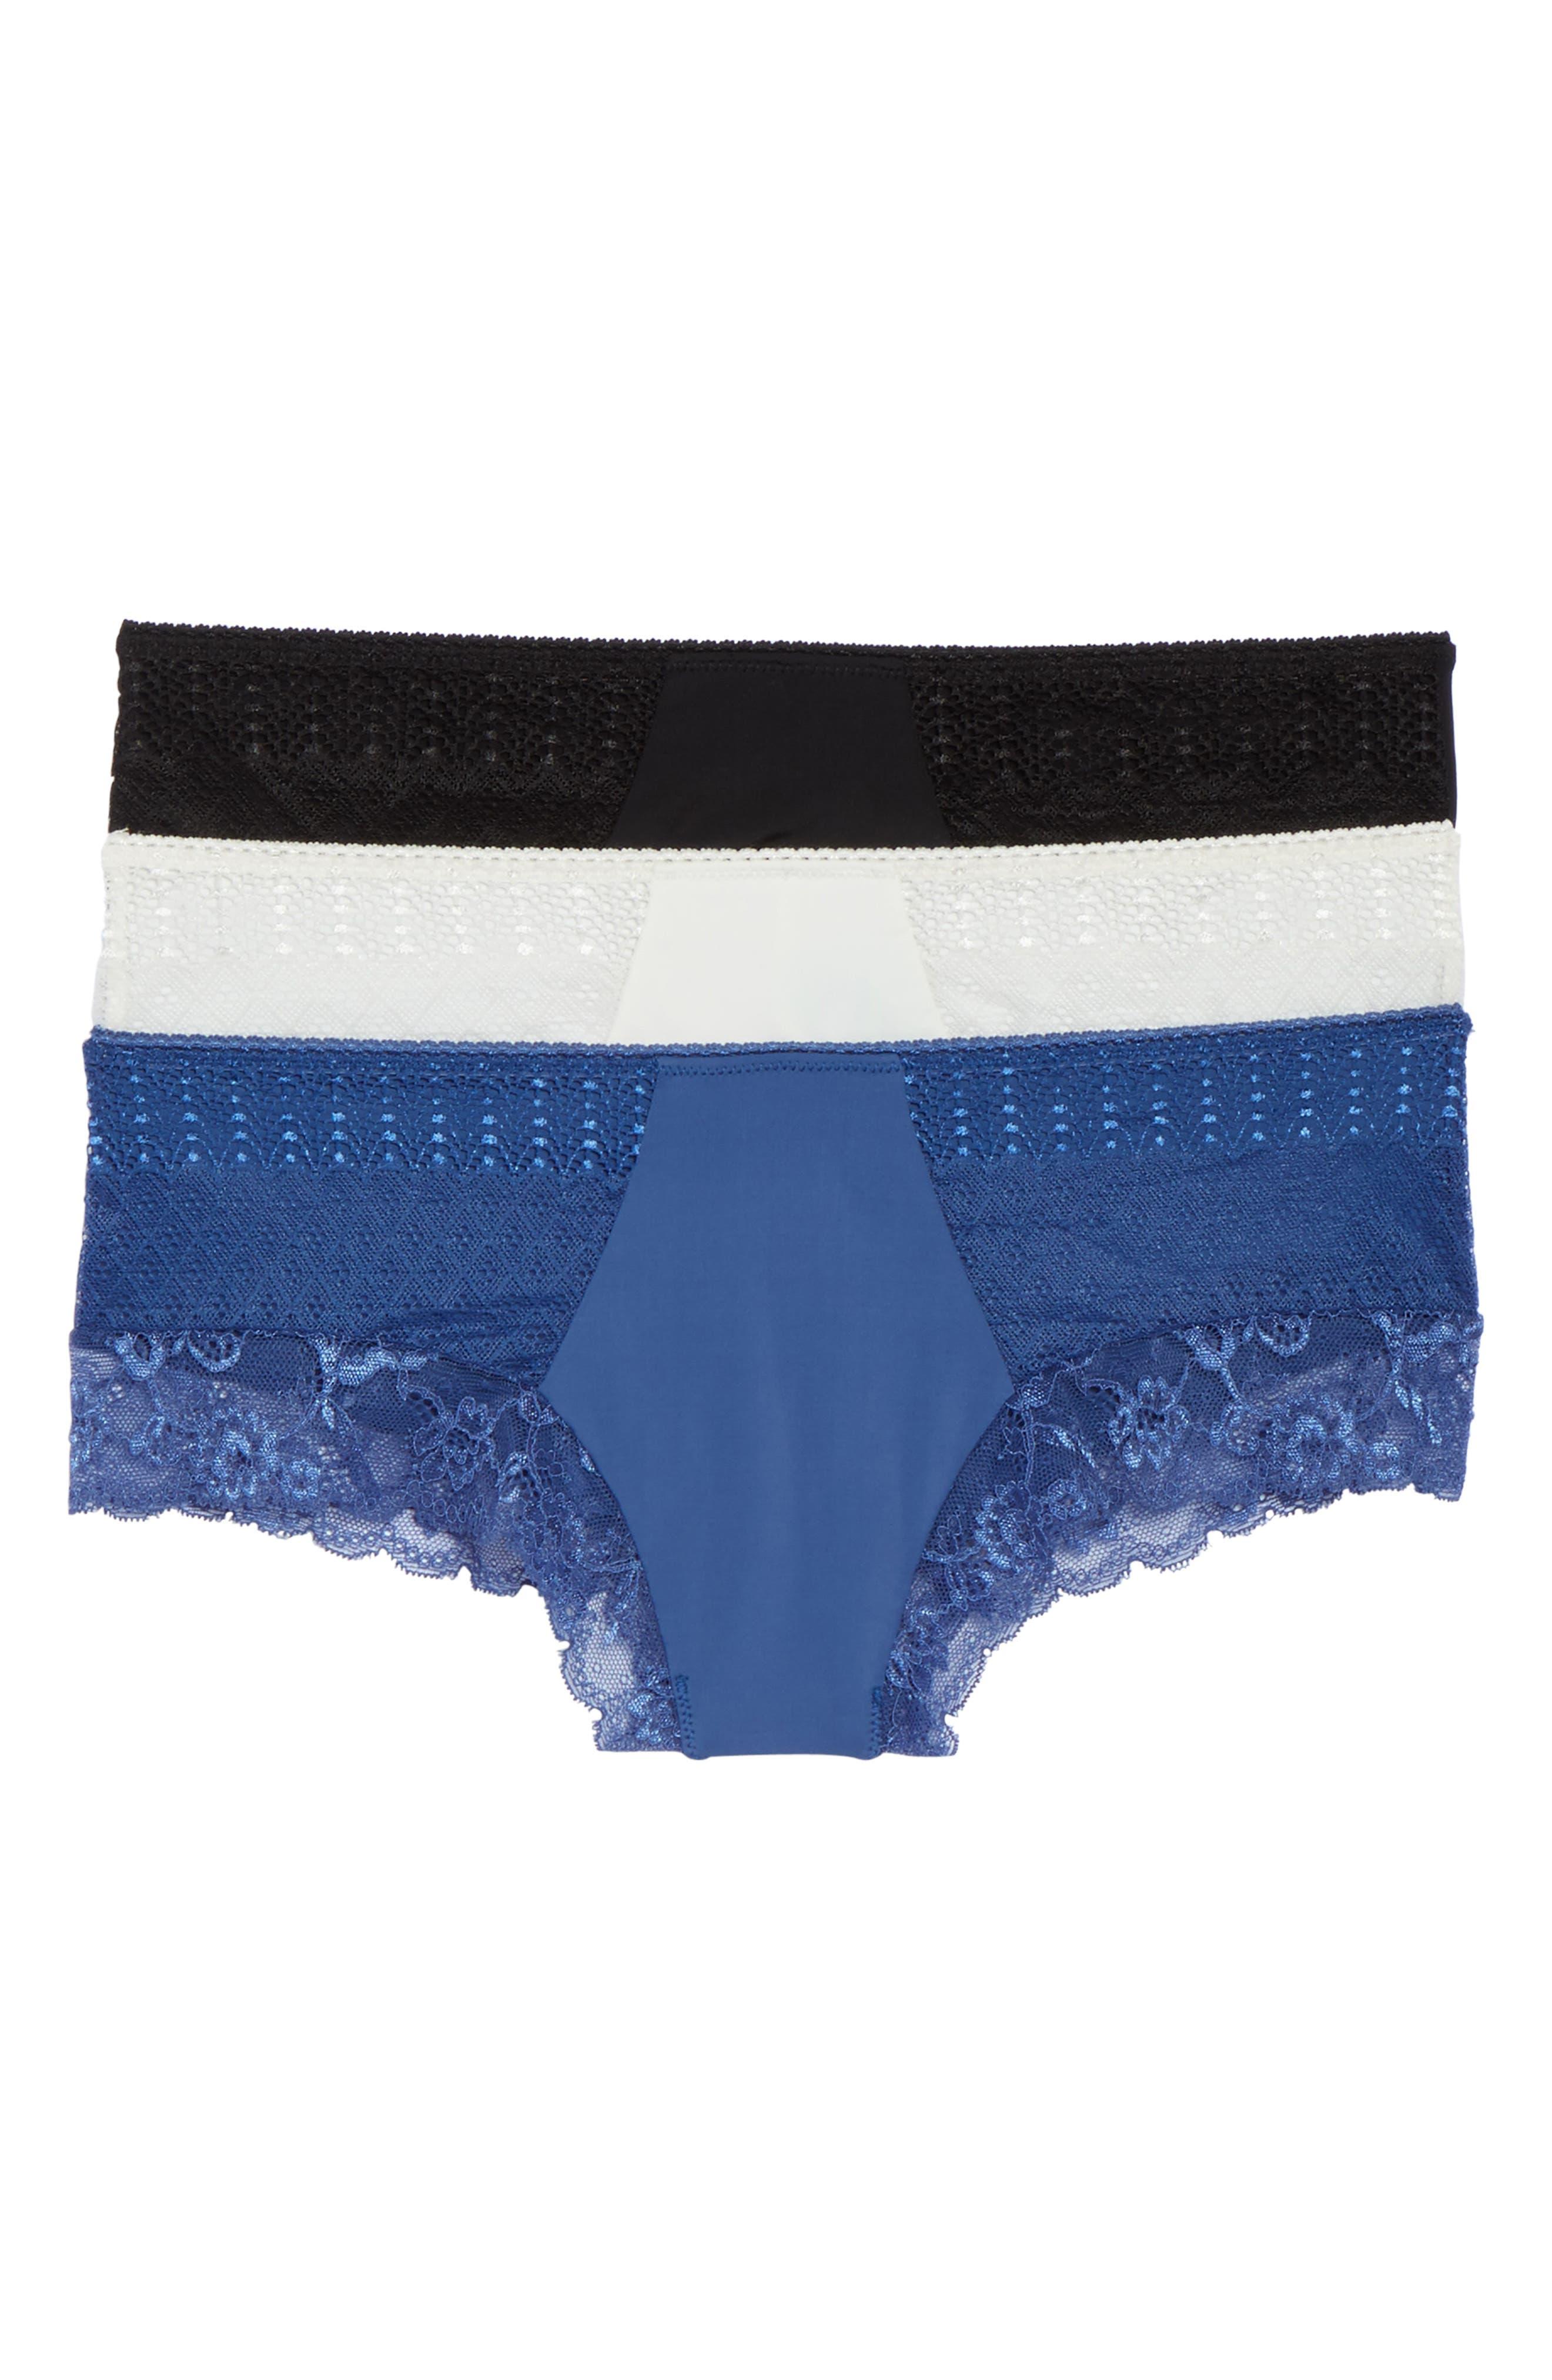 Main Image - Honeydew Intimates 3-Pack Lace Trim Hipster Panties